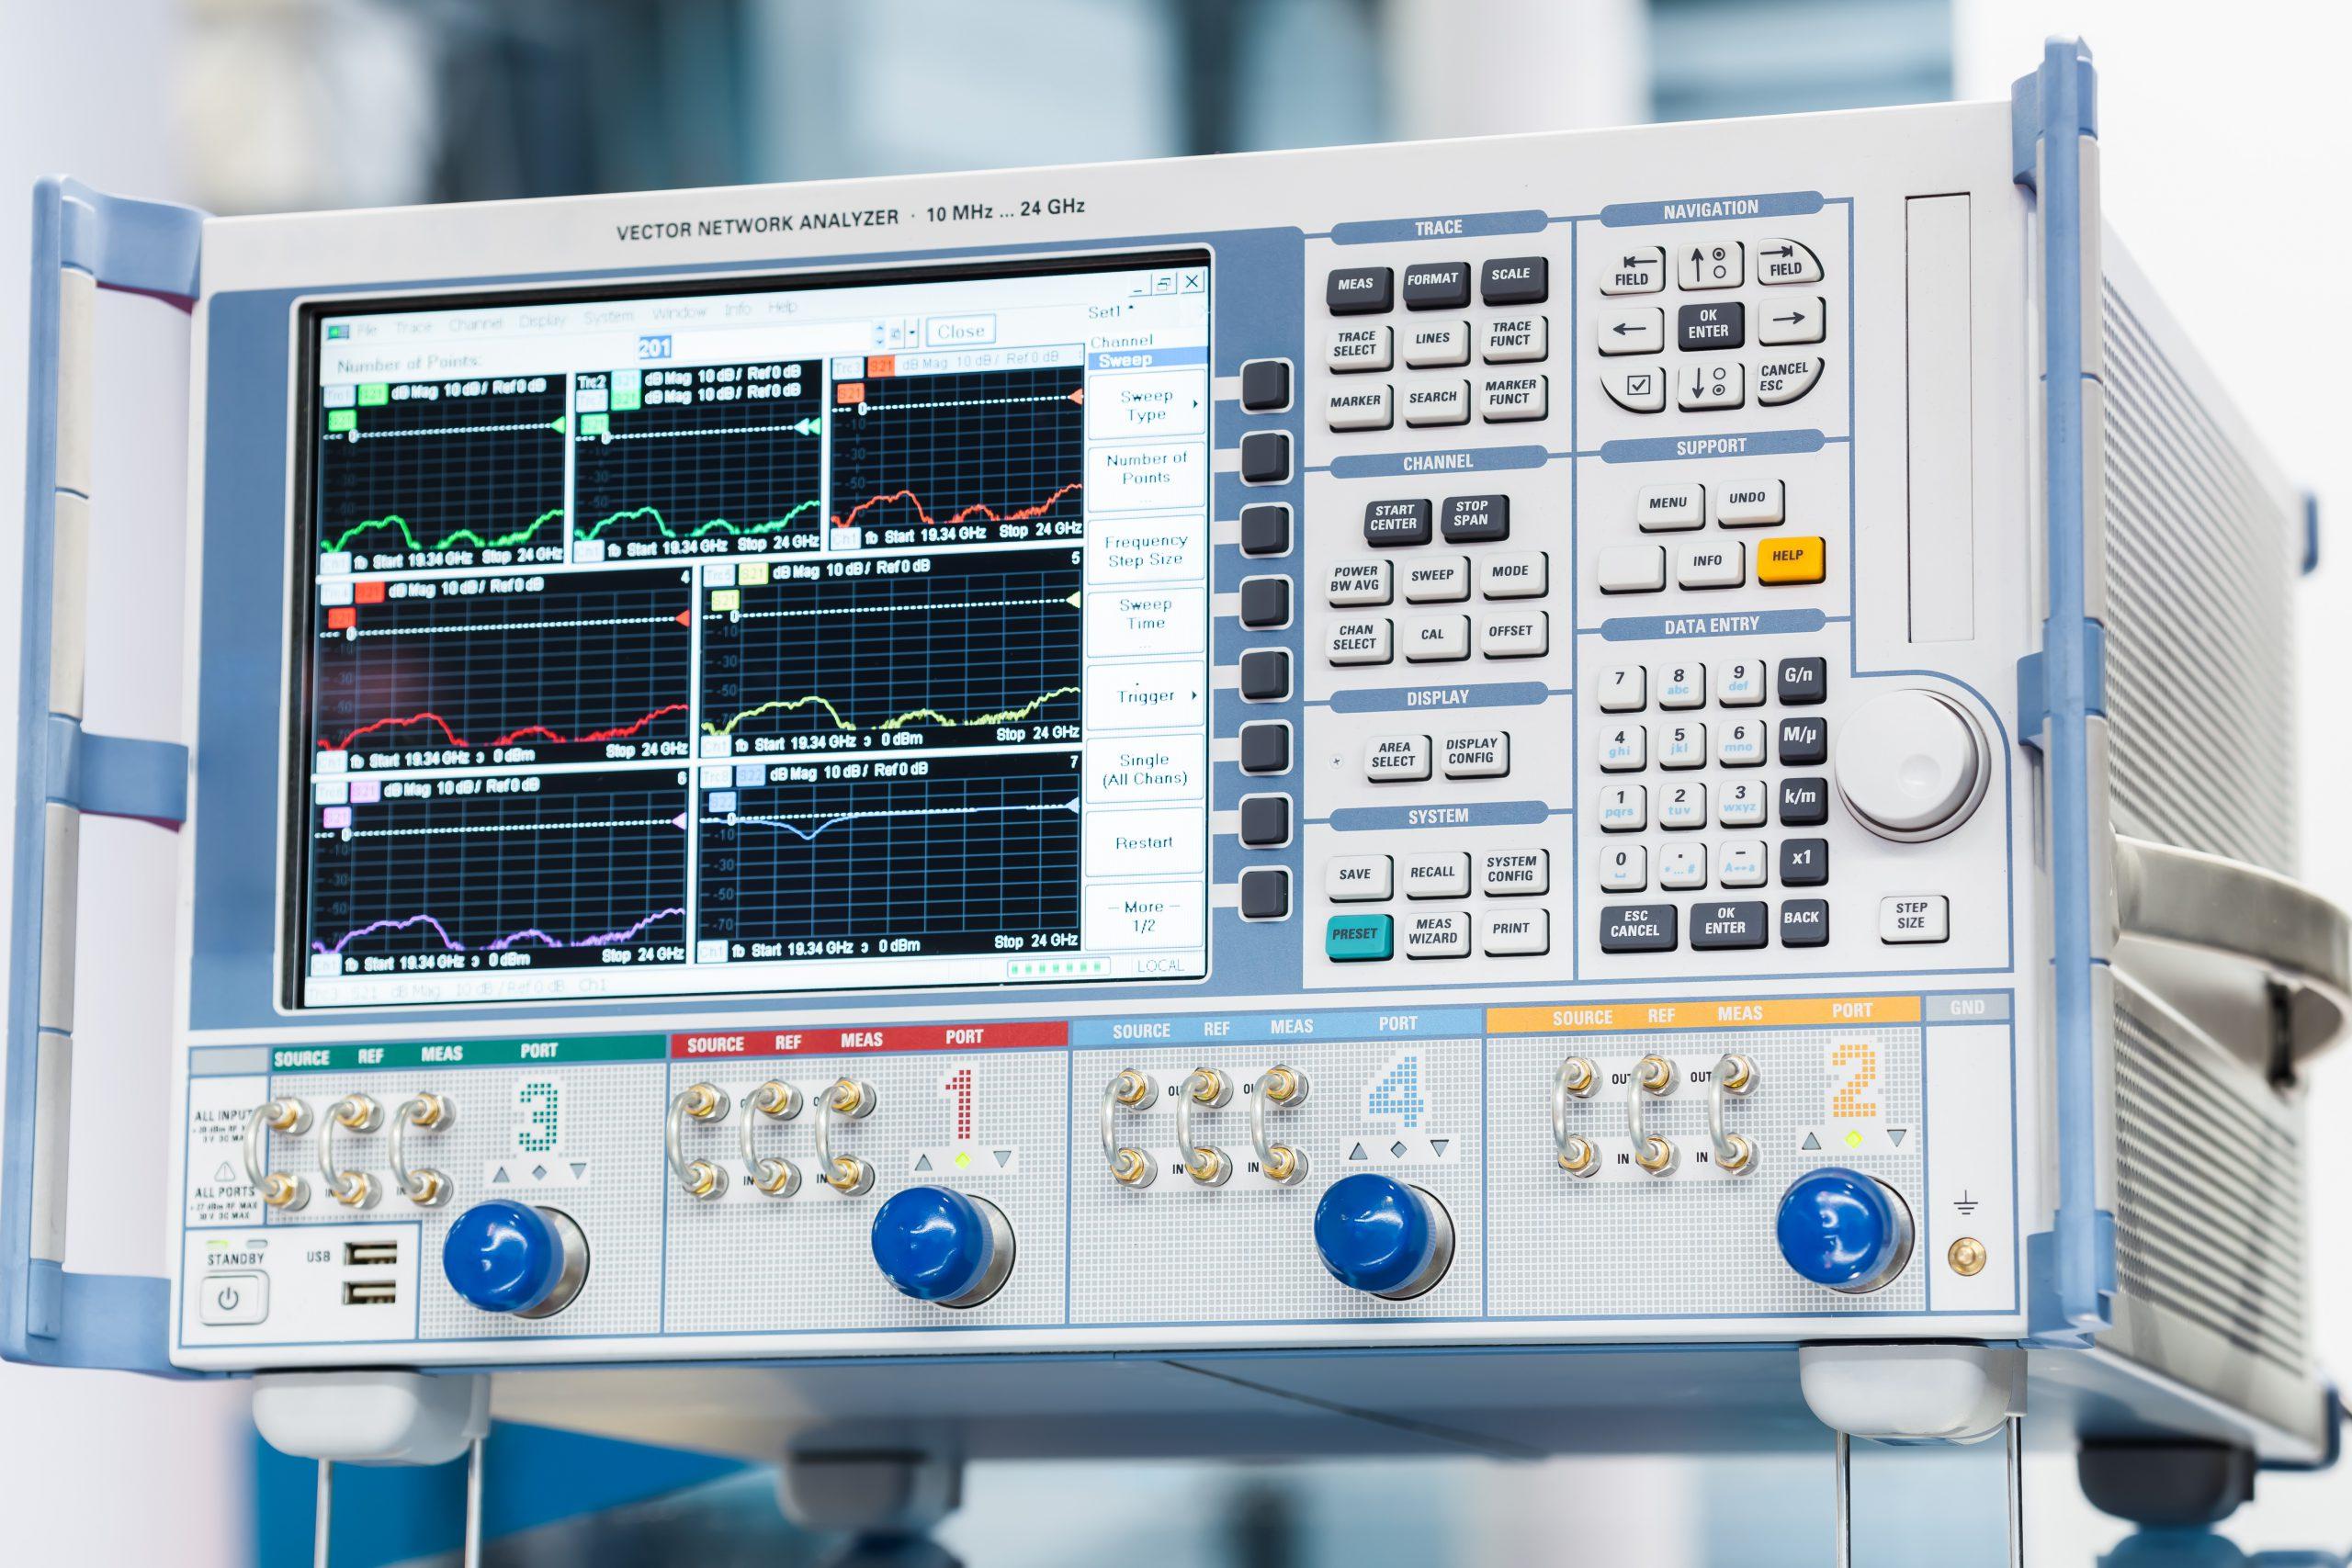 Vector network analyzer for S-parameter measurement